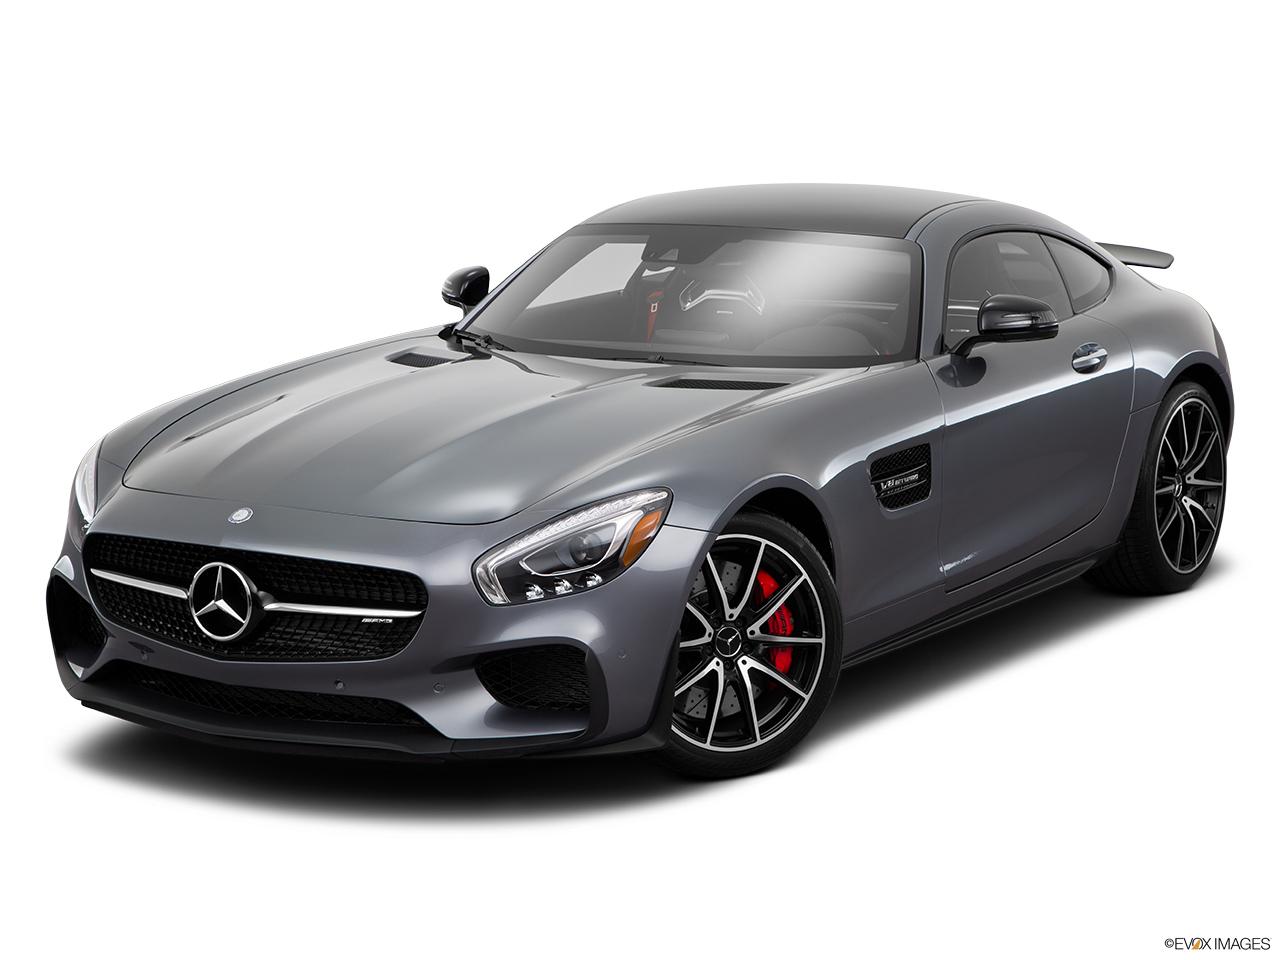 2016 mercedes benz amg gt prices in uae gulf specs for Mercedes benz gt price